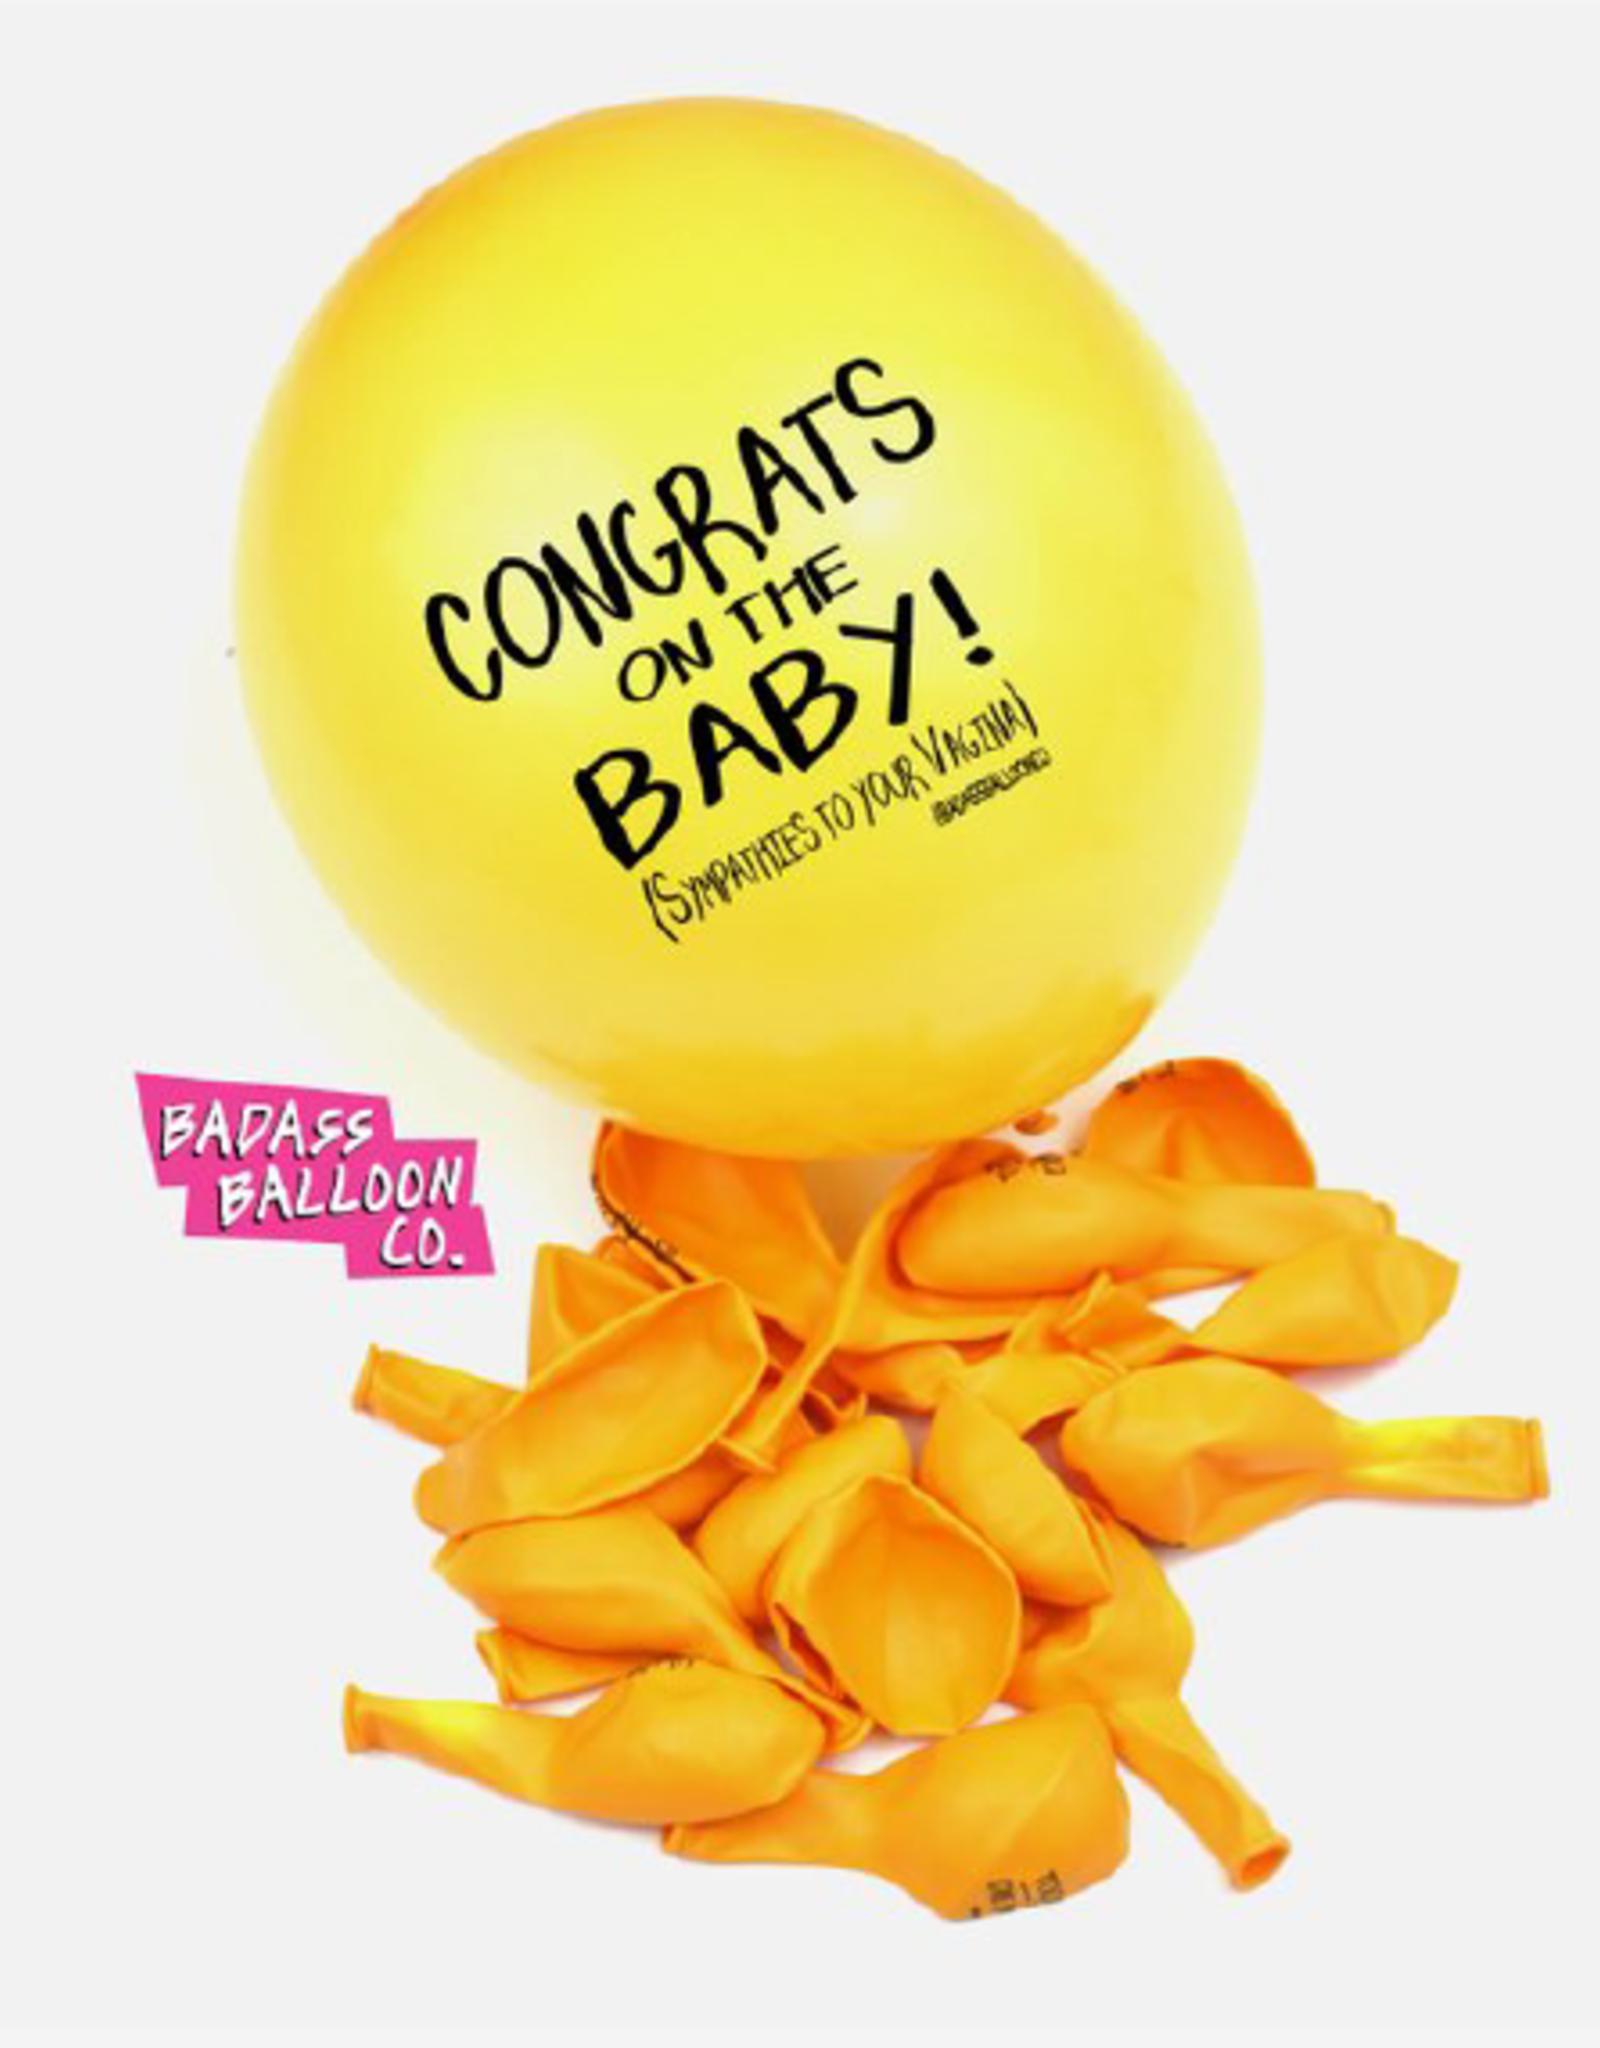 "Badass Balloons "" Congrats On the Baby!"" 12"" Latex Singles"